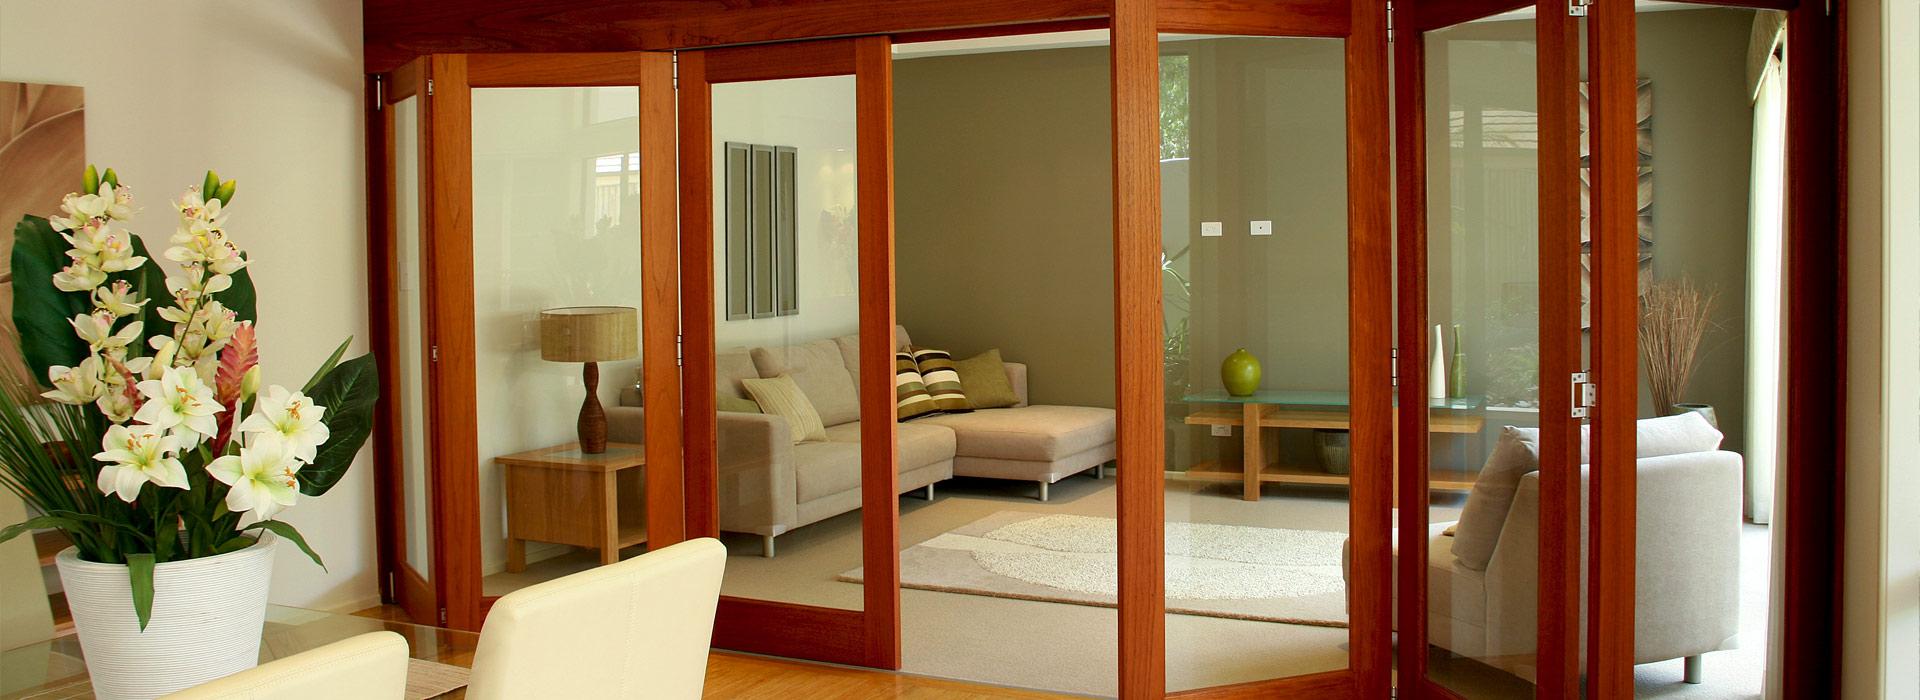 bifold doors finish